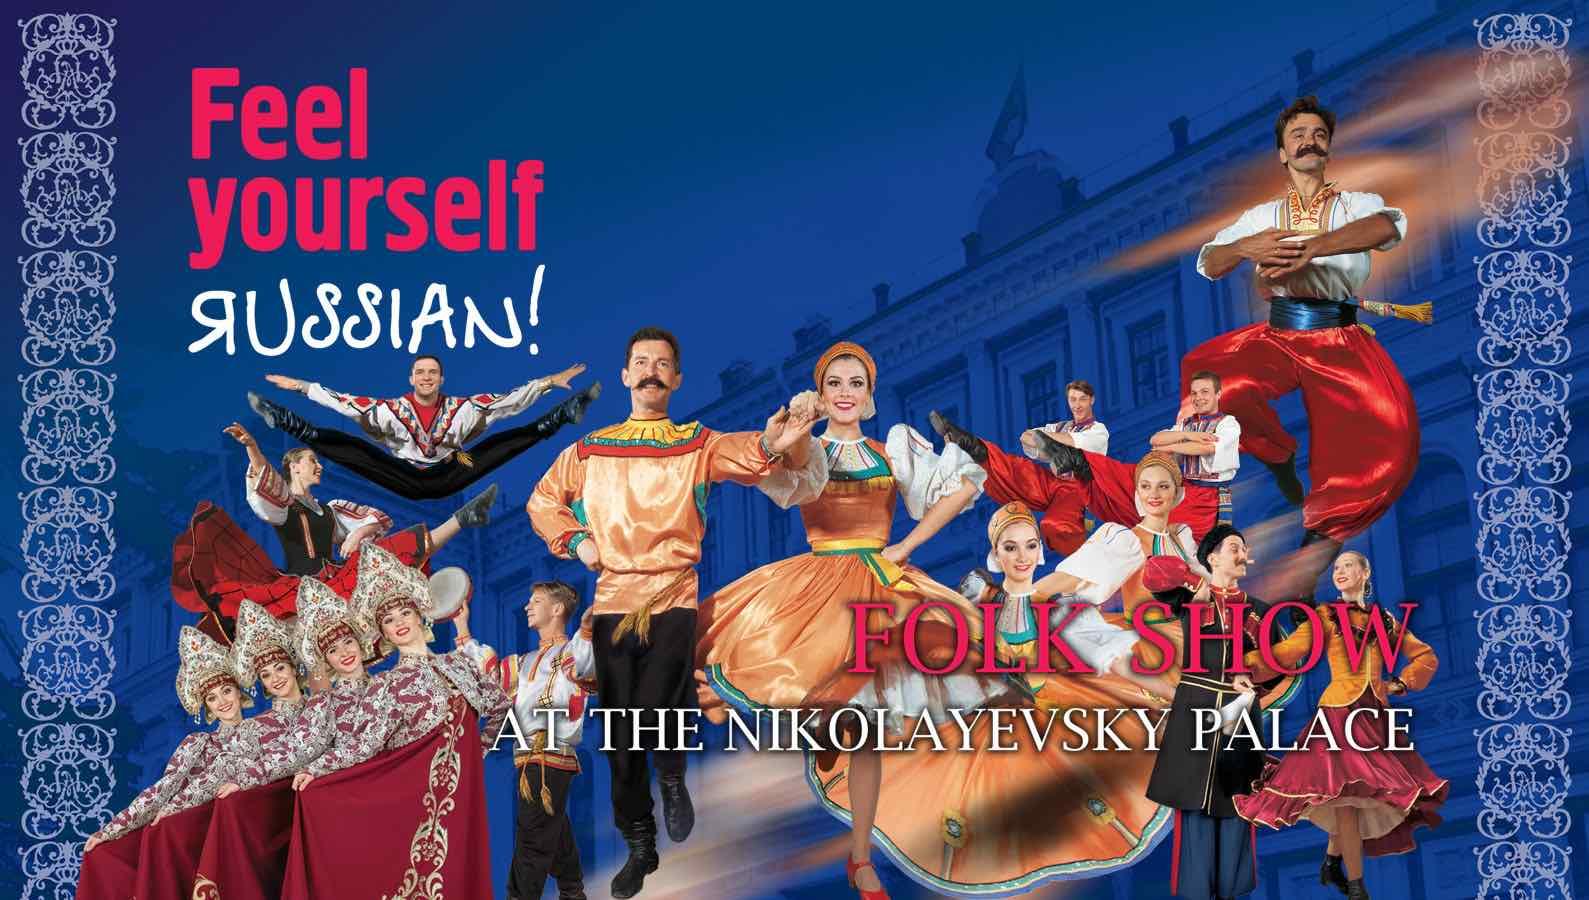 Feel yourself Russian - Folk Show